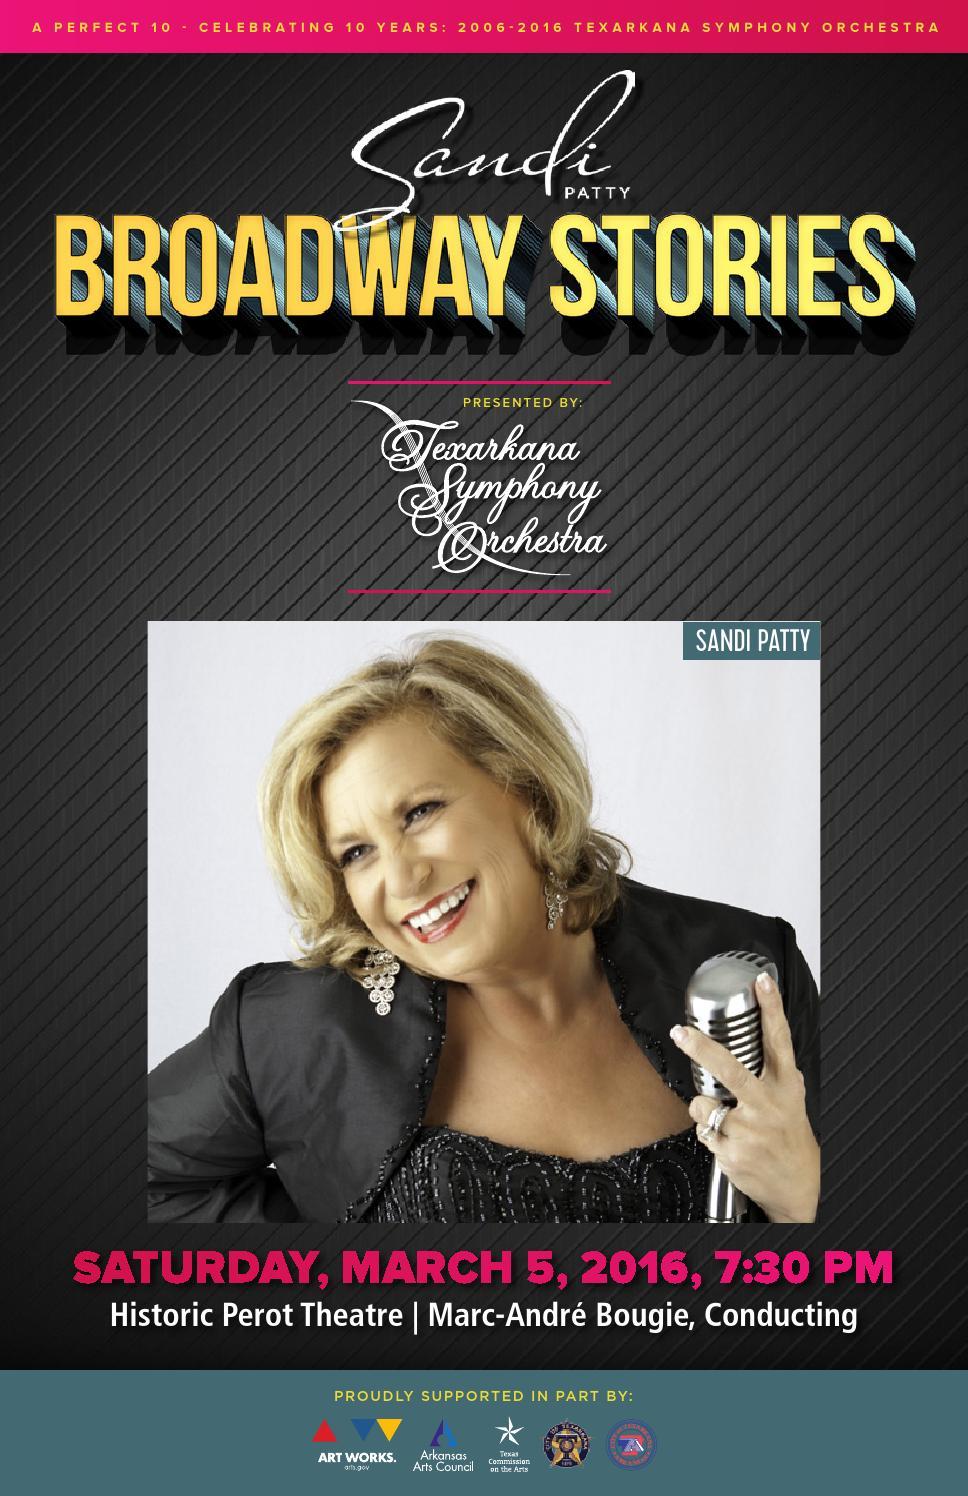 Sandi pattys first husband - Sandi Patty S Broadway Stories Concert Program By Texarkana Symphony Orchestra Issuu